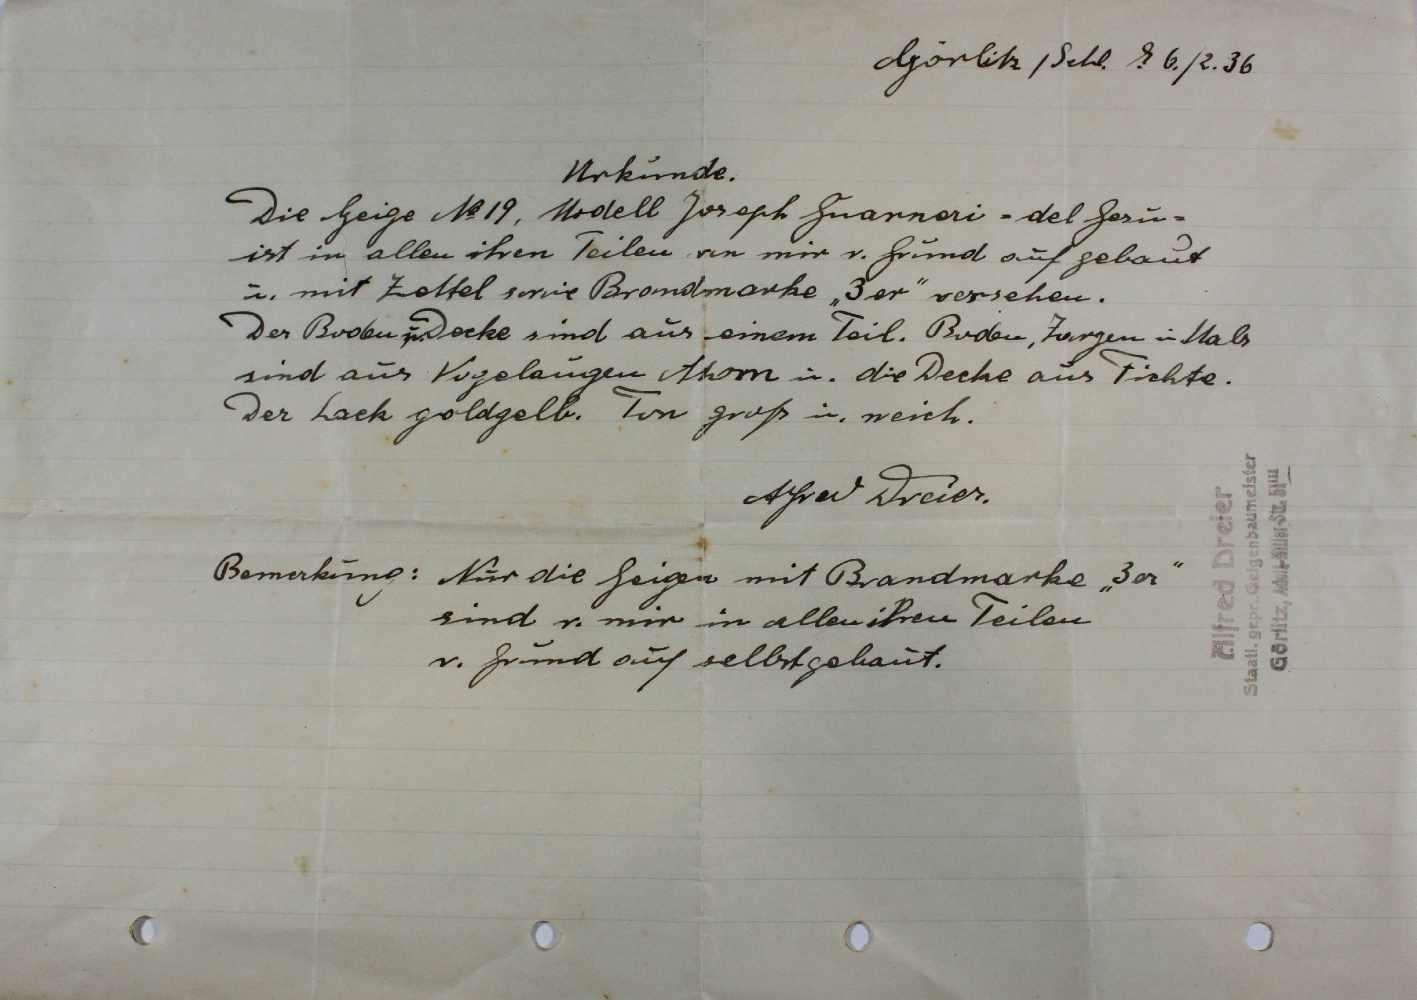 Lot 17 - Geige, Modell Joseph Guarnori - del Jesu, Geigenbauer: Alfred Dreter, Urkunde von 6.2.36.